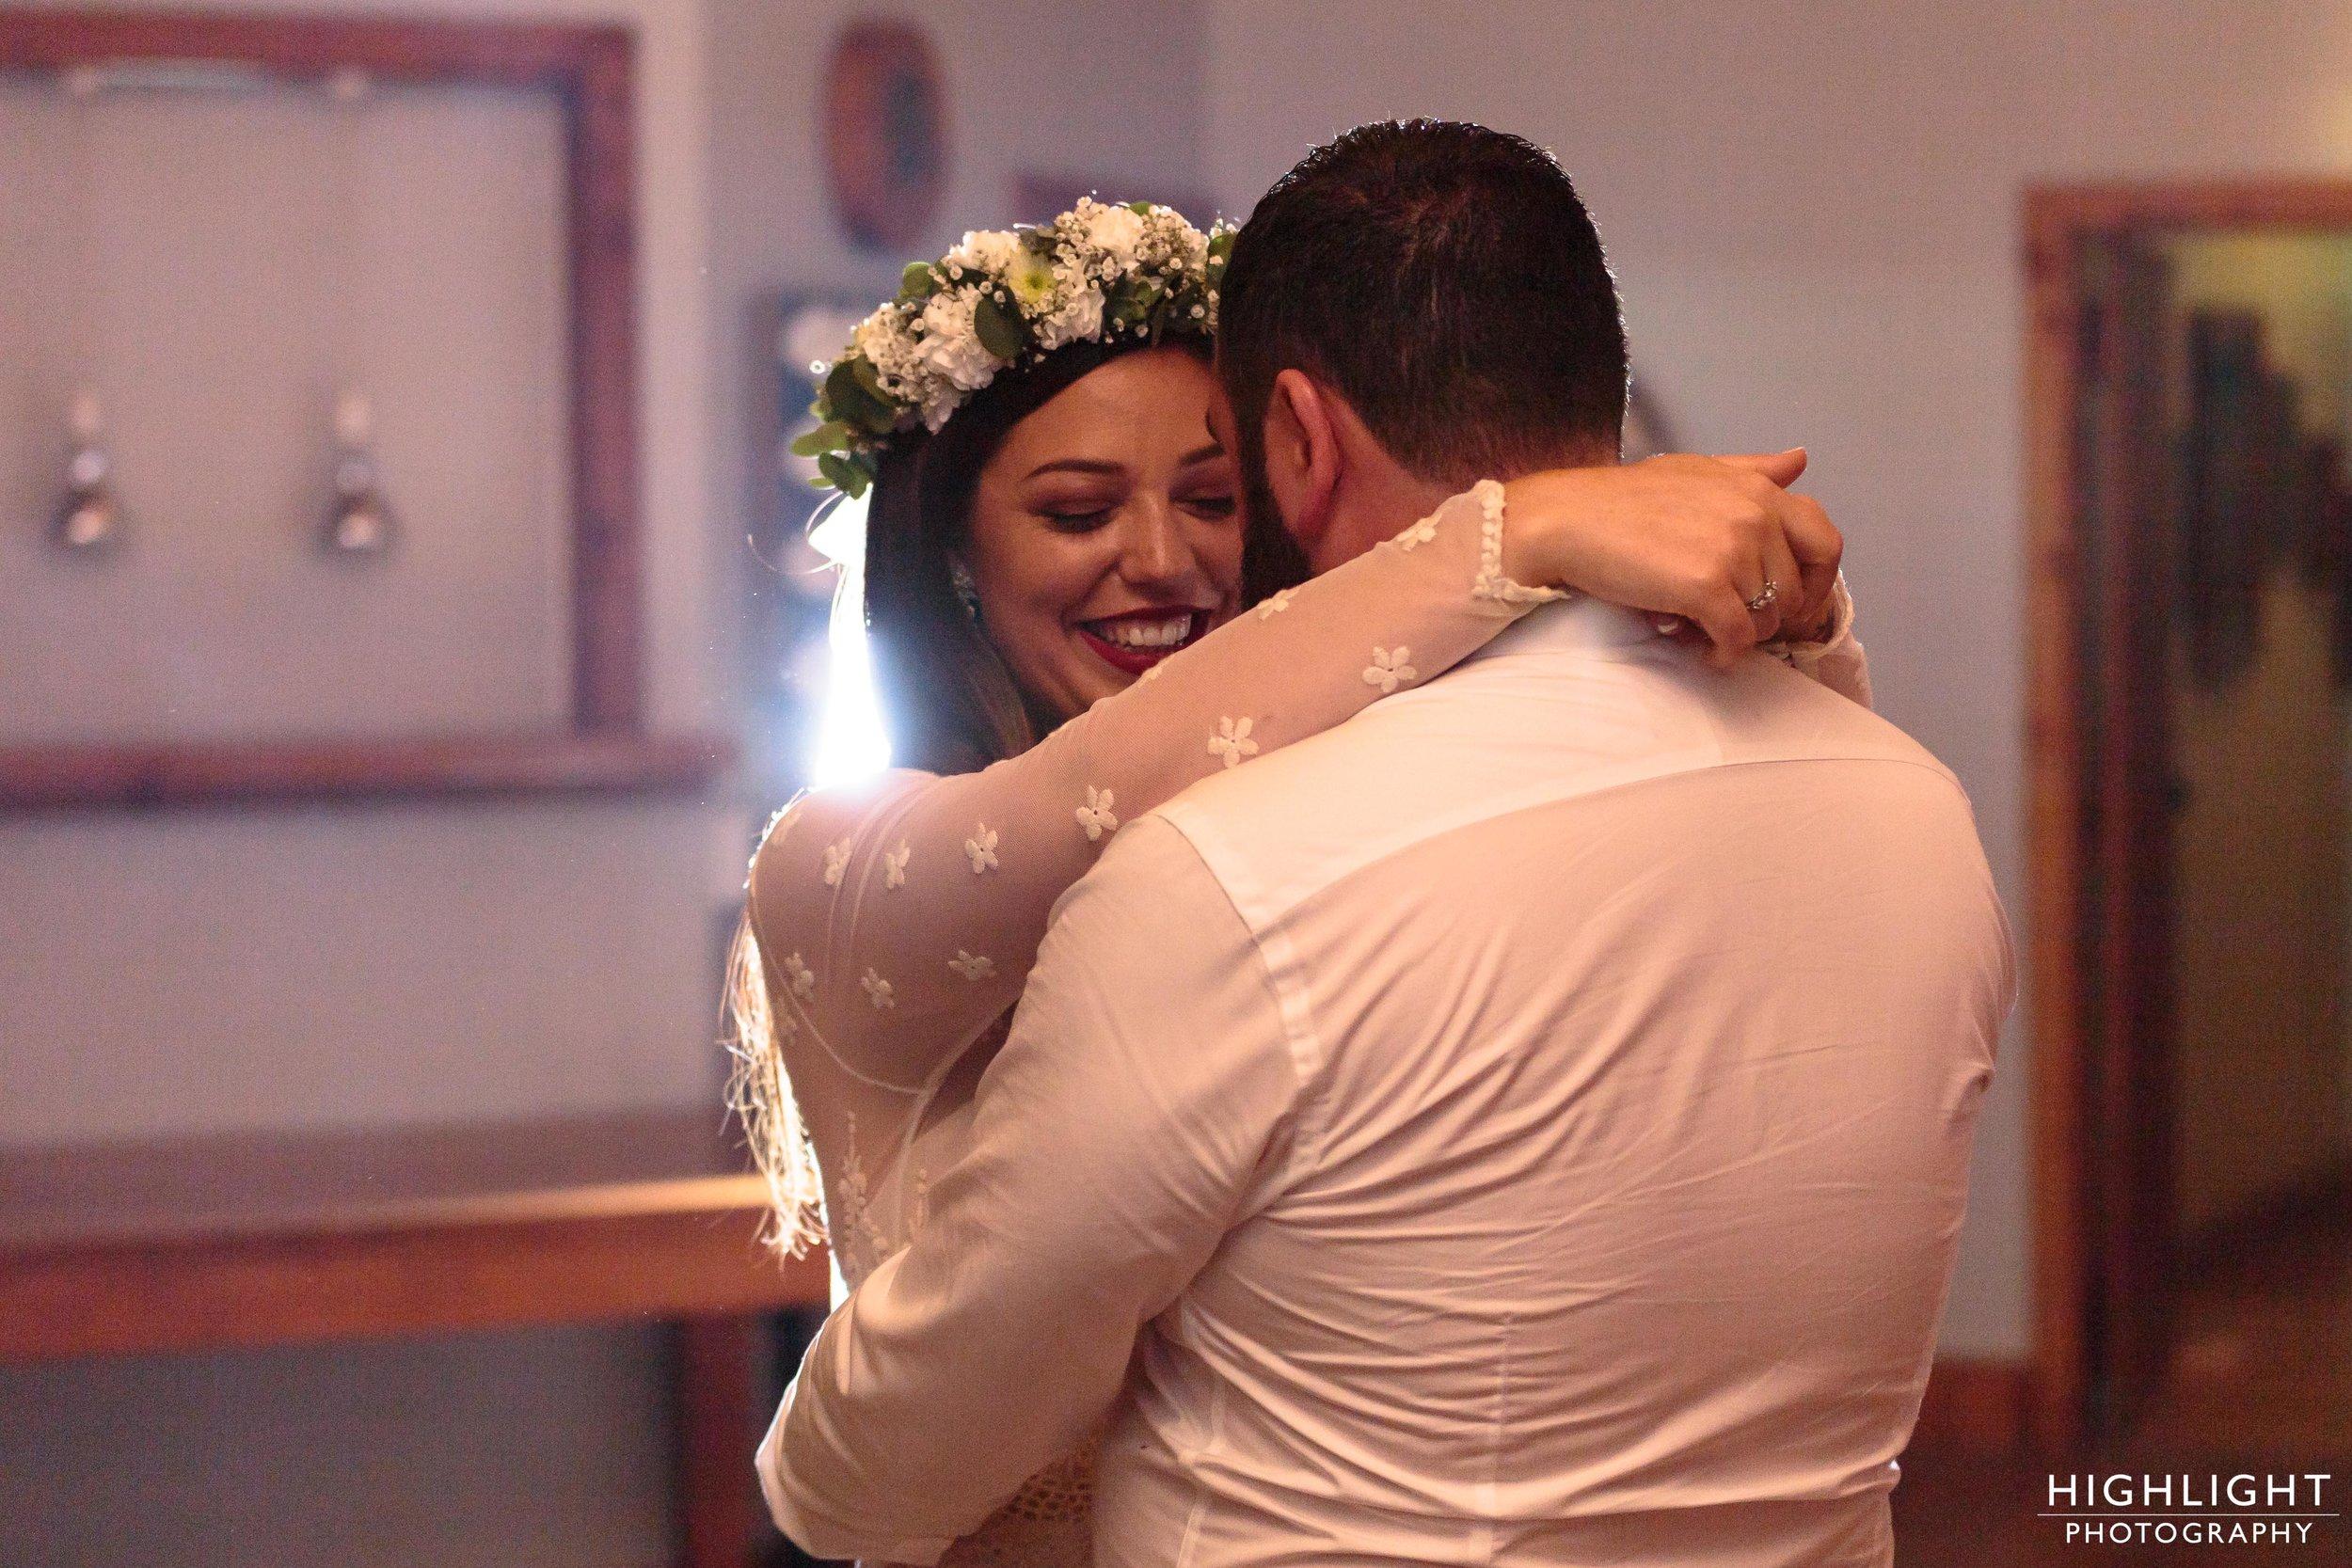 highlight-wedding-photography-new-zealand-makoura-lodge-wedding-188.jpg